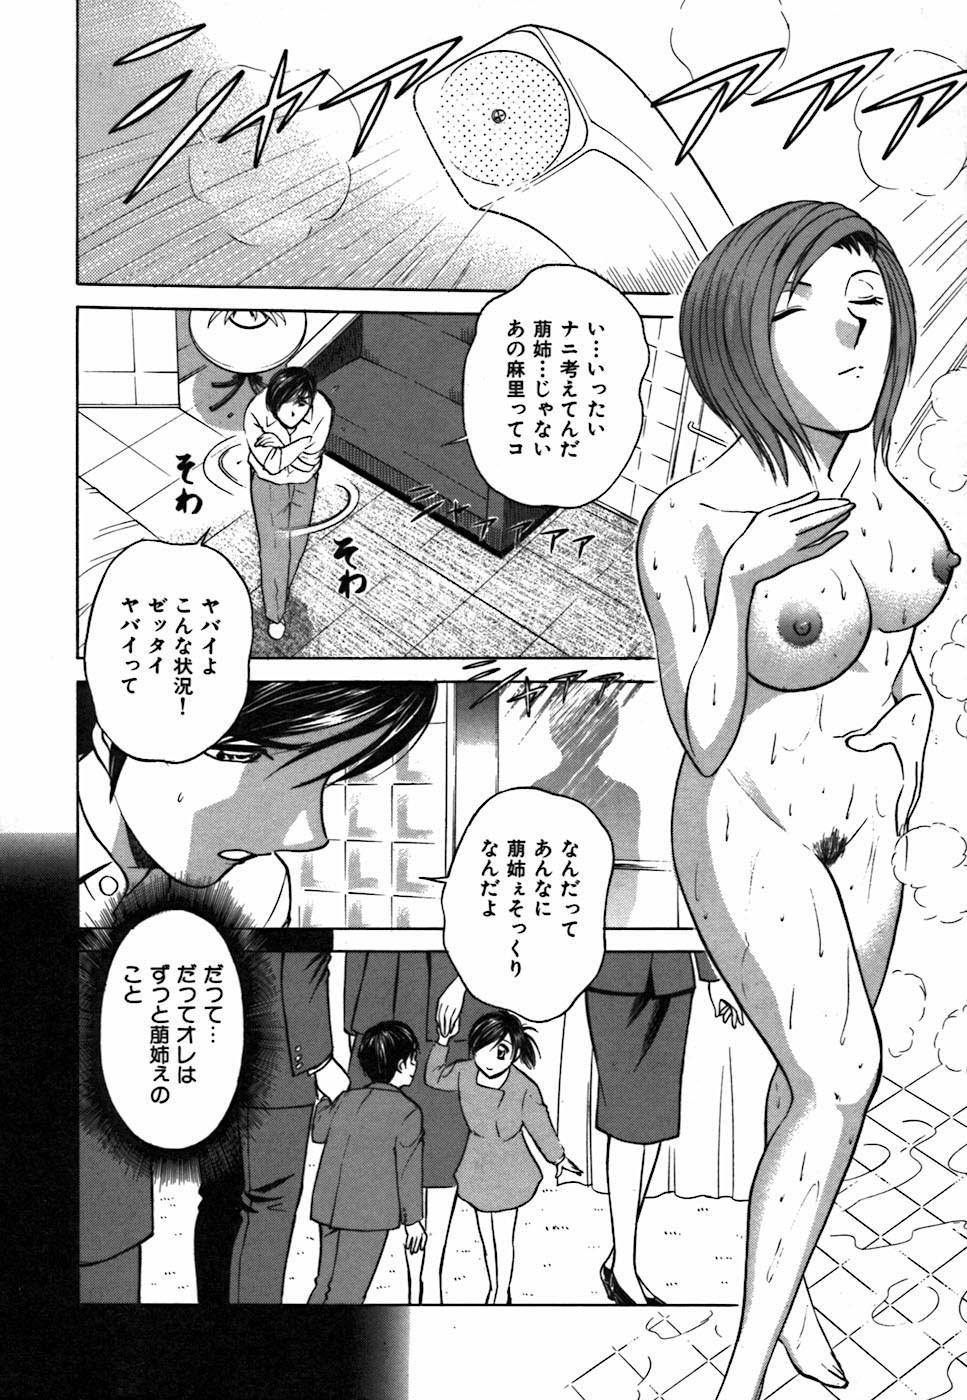 Kimi ga Nozomu Katachi | Appearance for which you hope 149